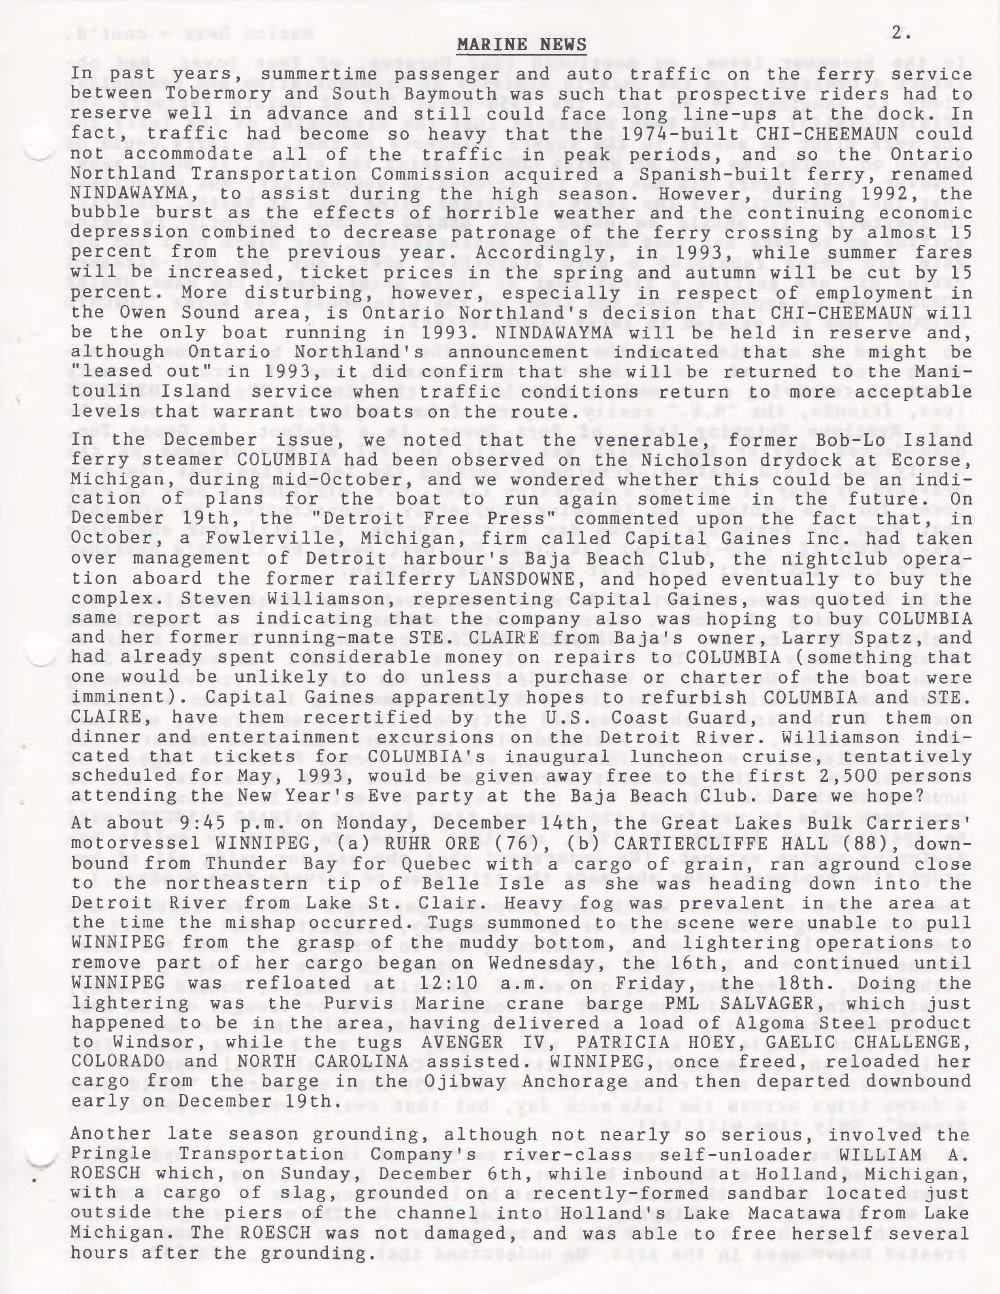 Scanner, v. 25, no. 4 (January 1993)